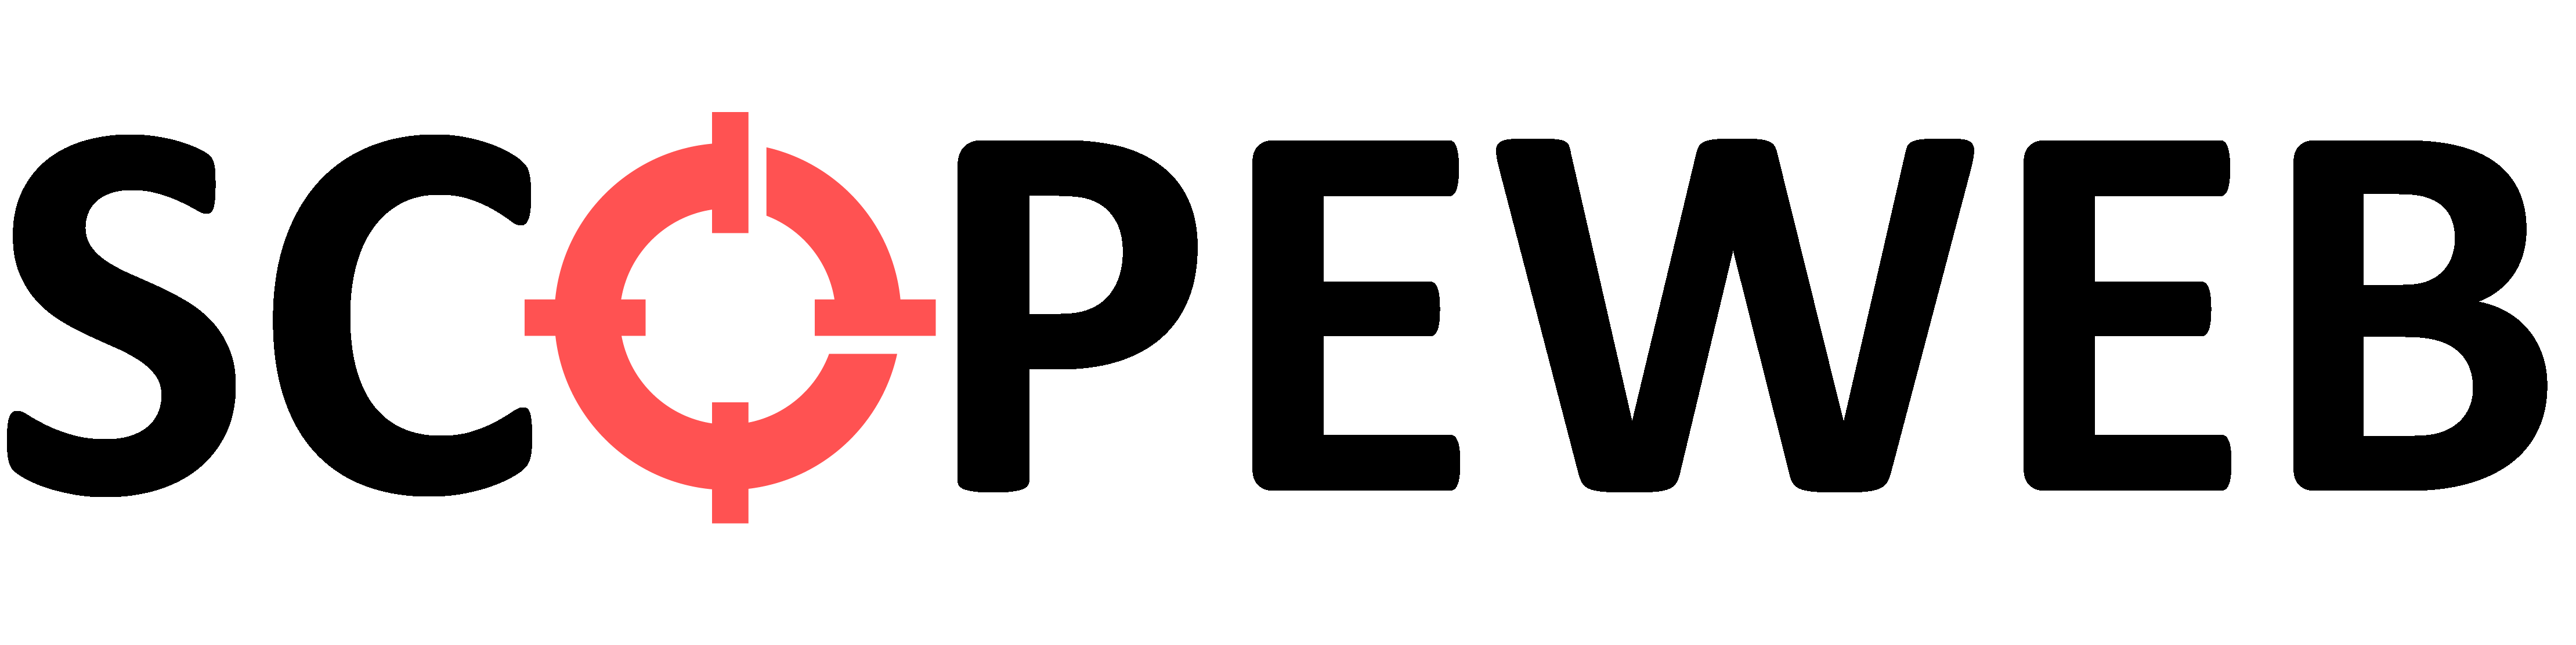 scopeweb.nl - logo normal version